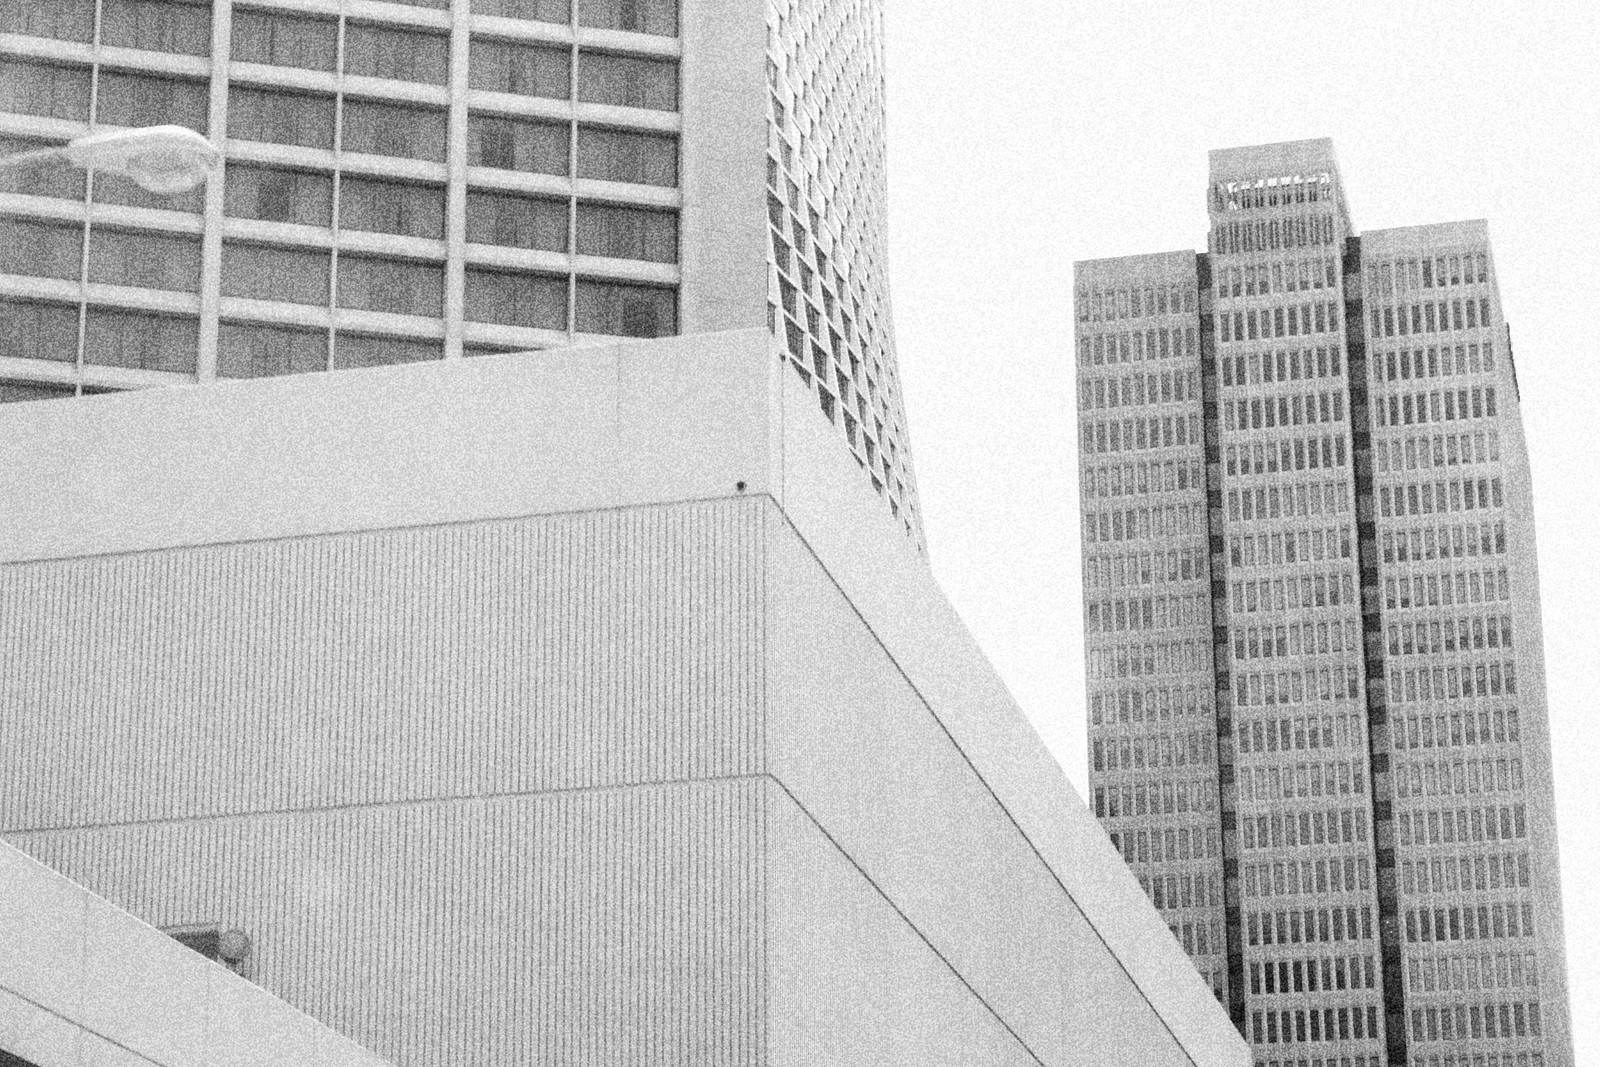 Atlanta Center, Atlanta Marriot Marquis, Peachtree Center, Downtown Atlanta